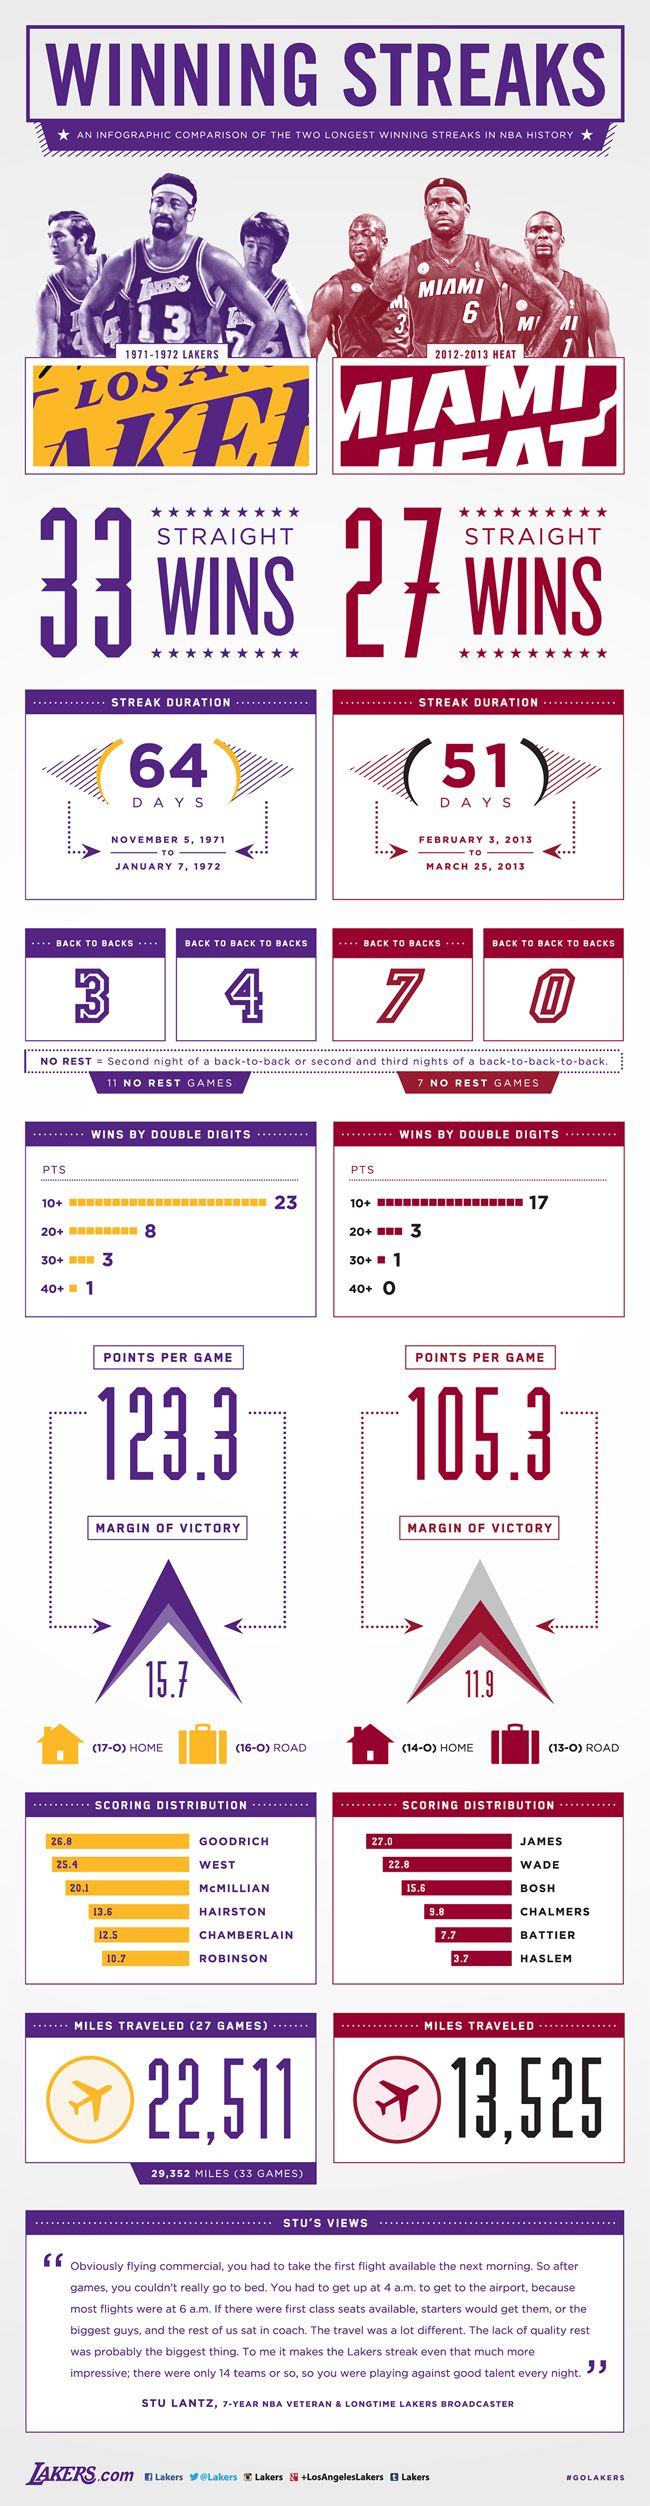 [#56] in 7 tweets |  Two Longest Winning Streaks In NBA History [infographic] | Alex Shaikh Dot Com